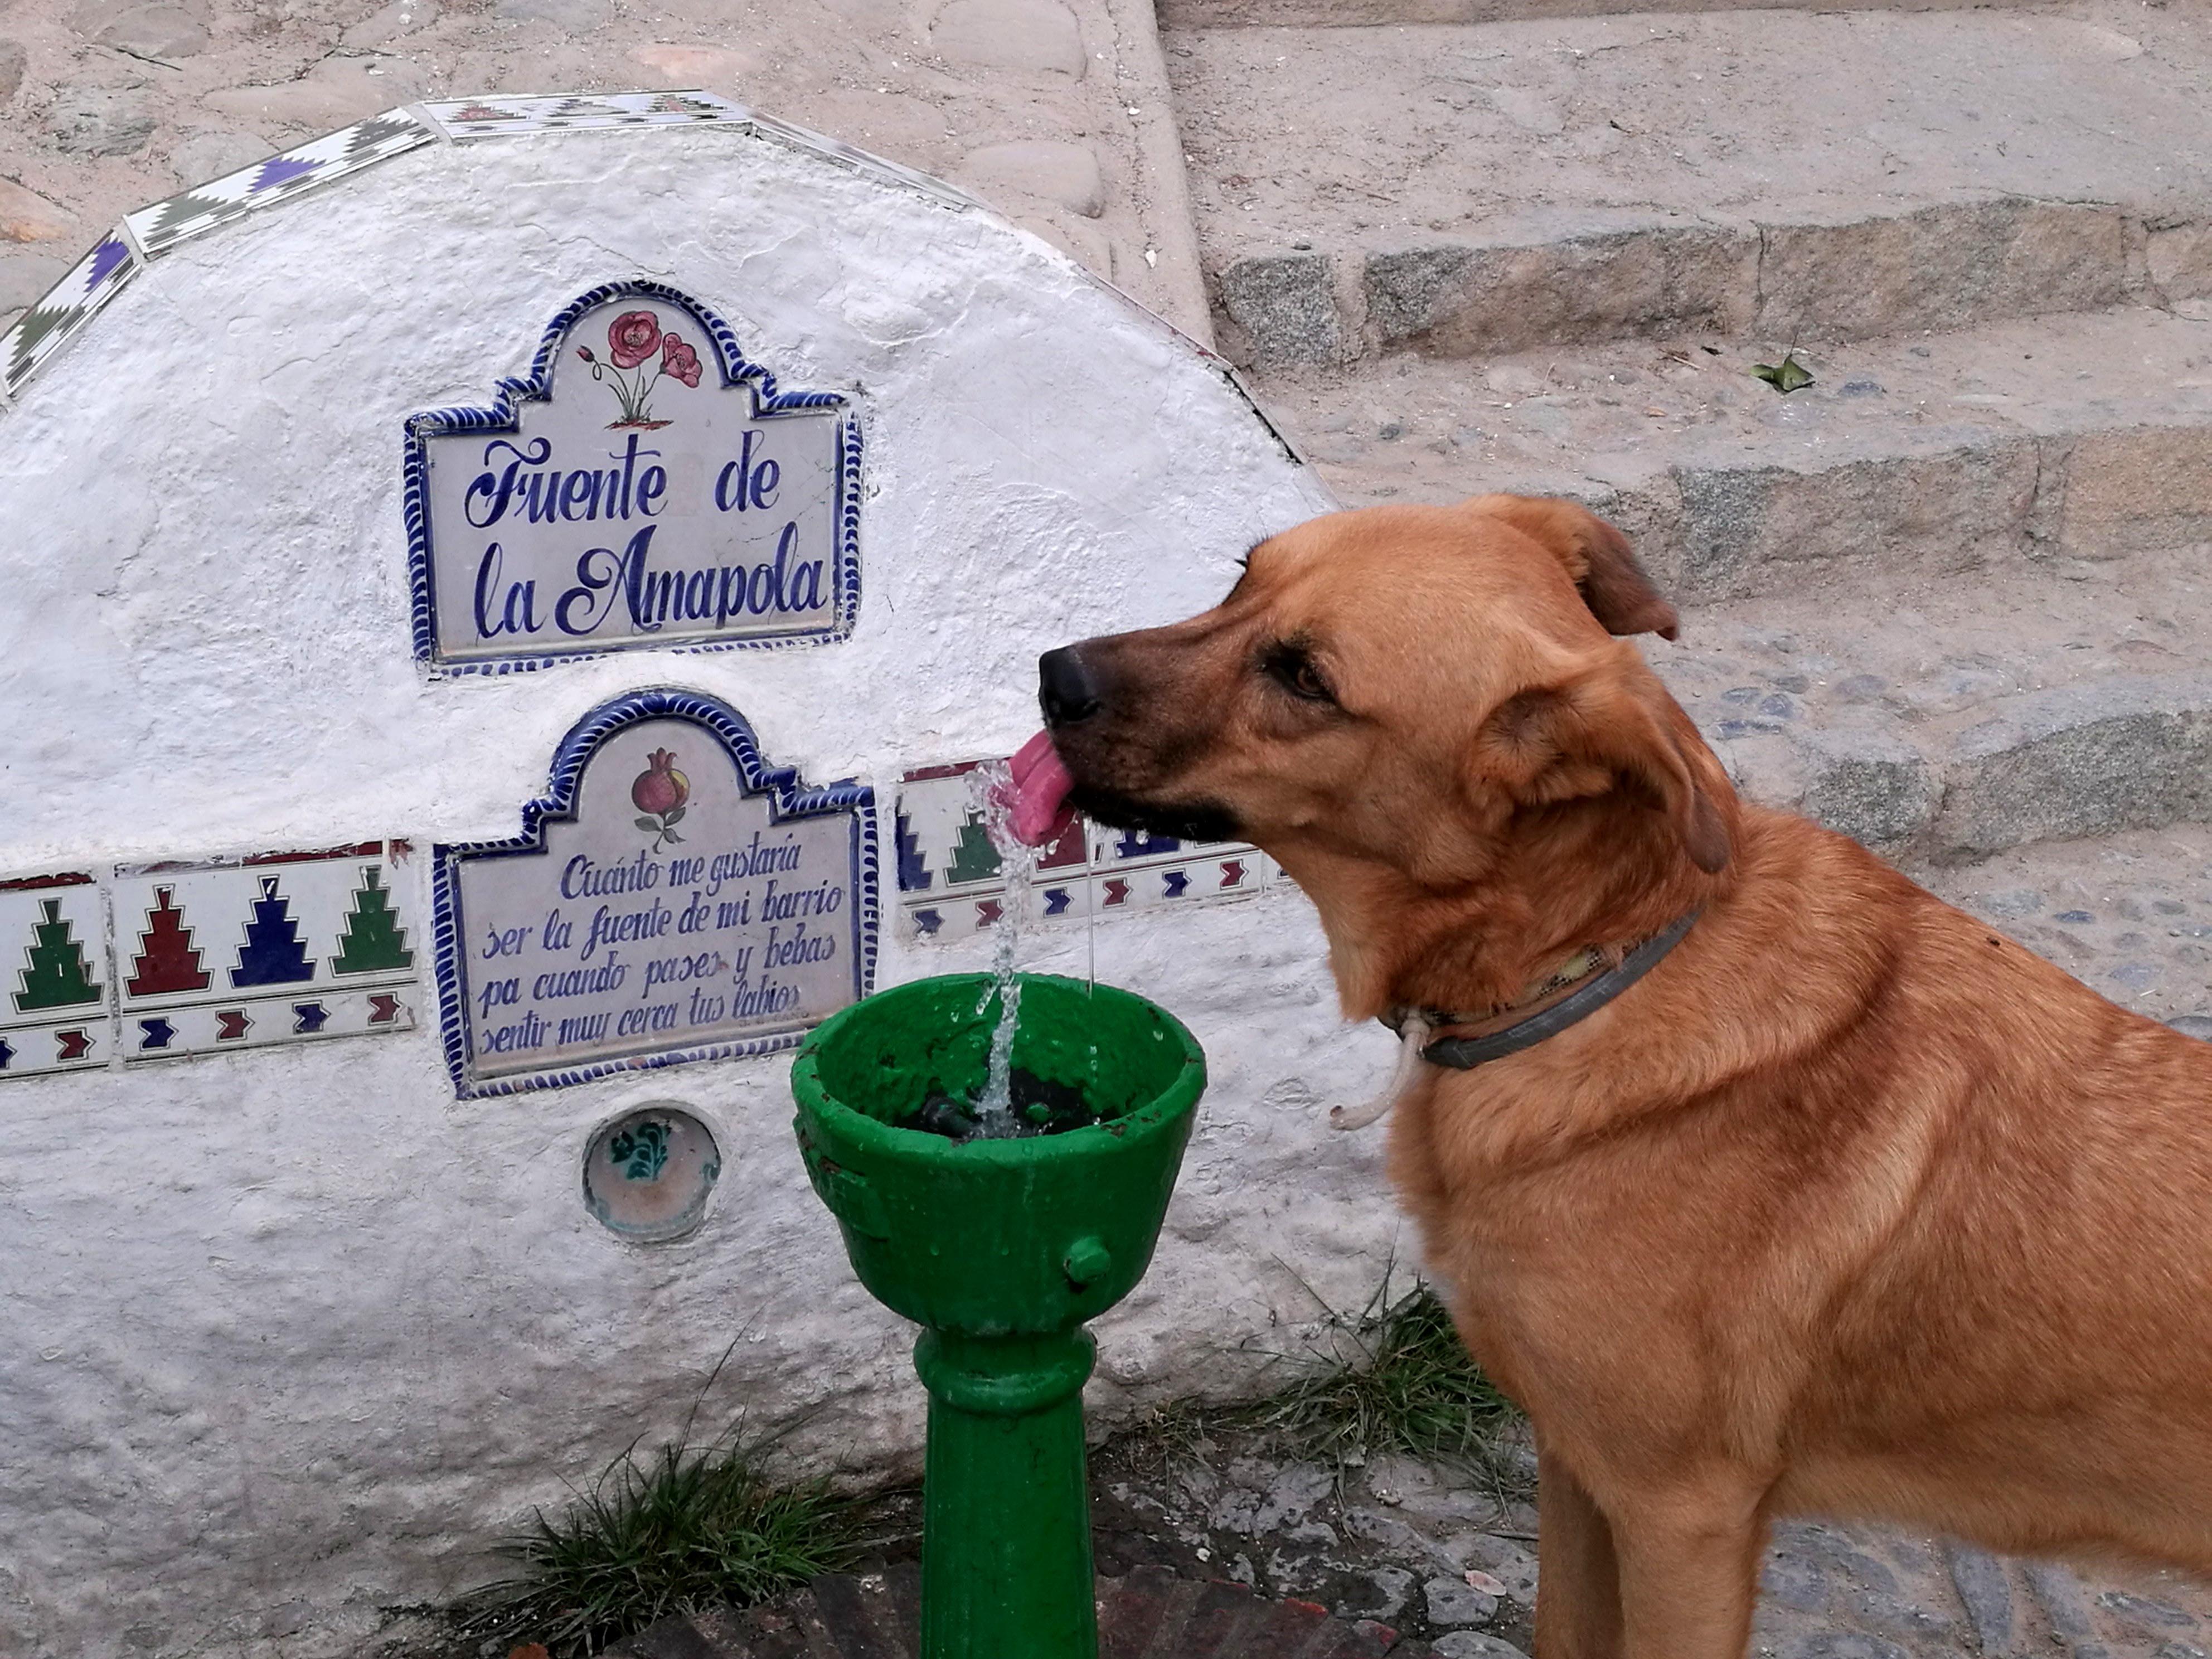 Proctor en Segovia explores the Sacromonte neighborhood of Granada